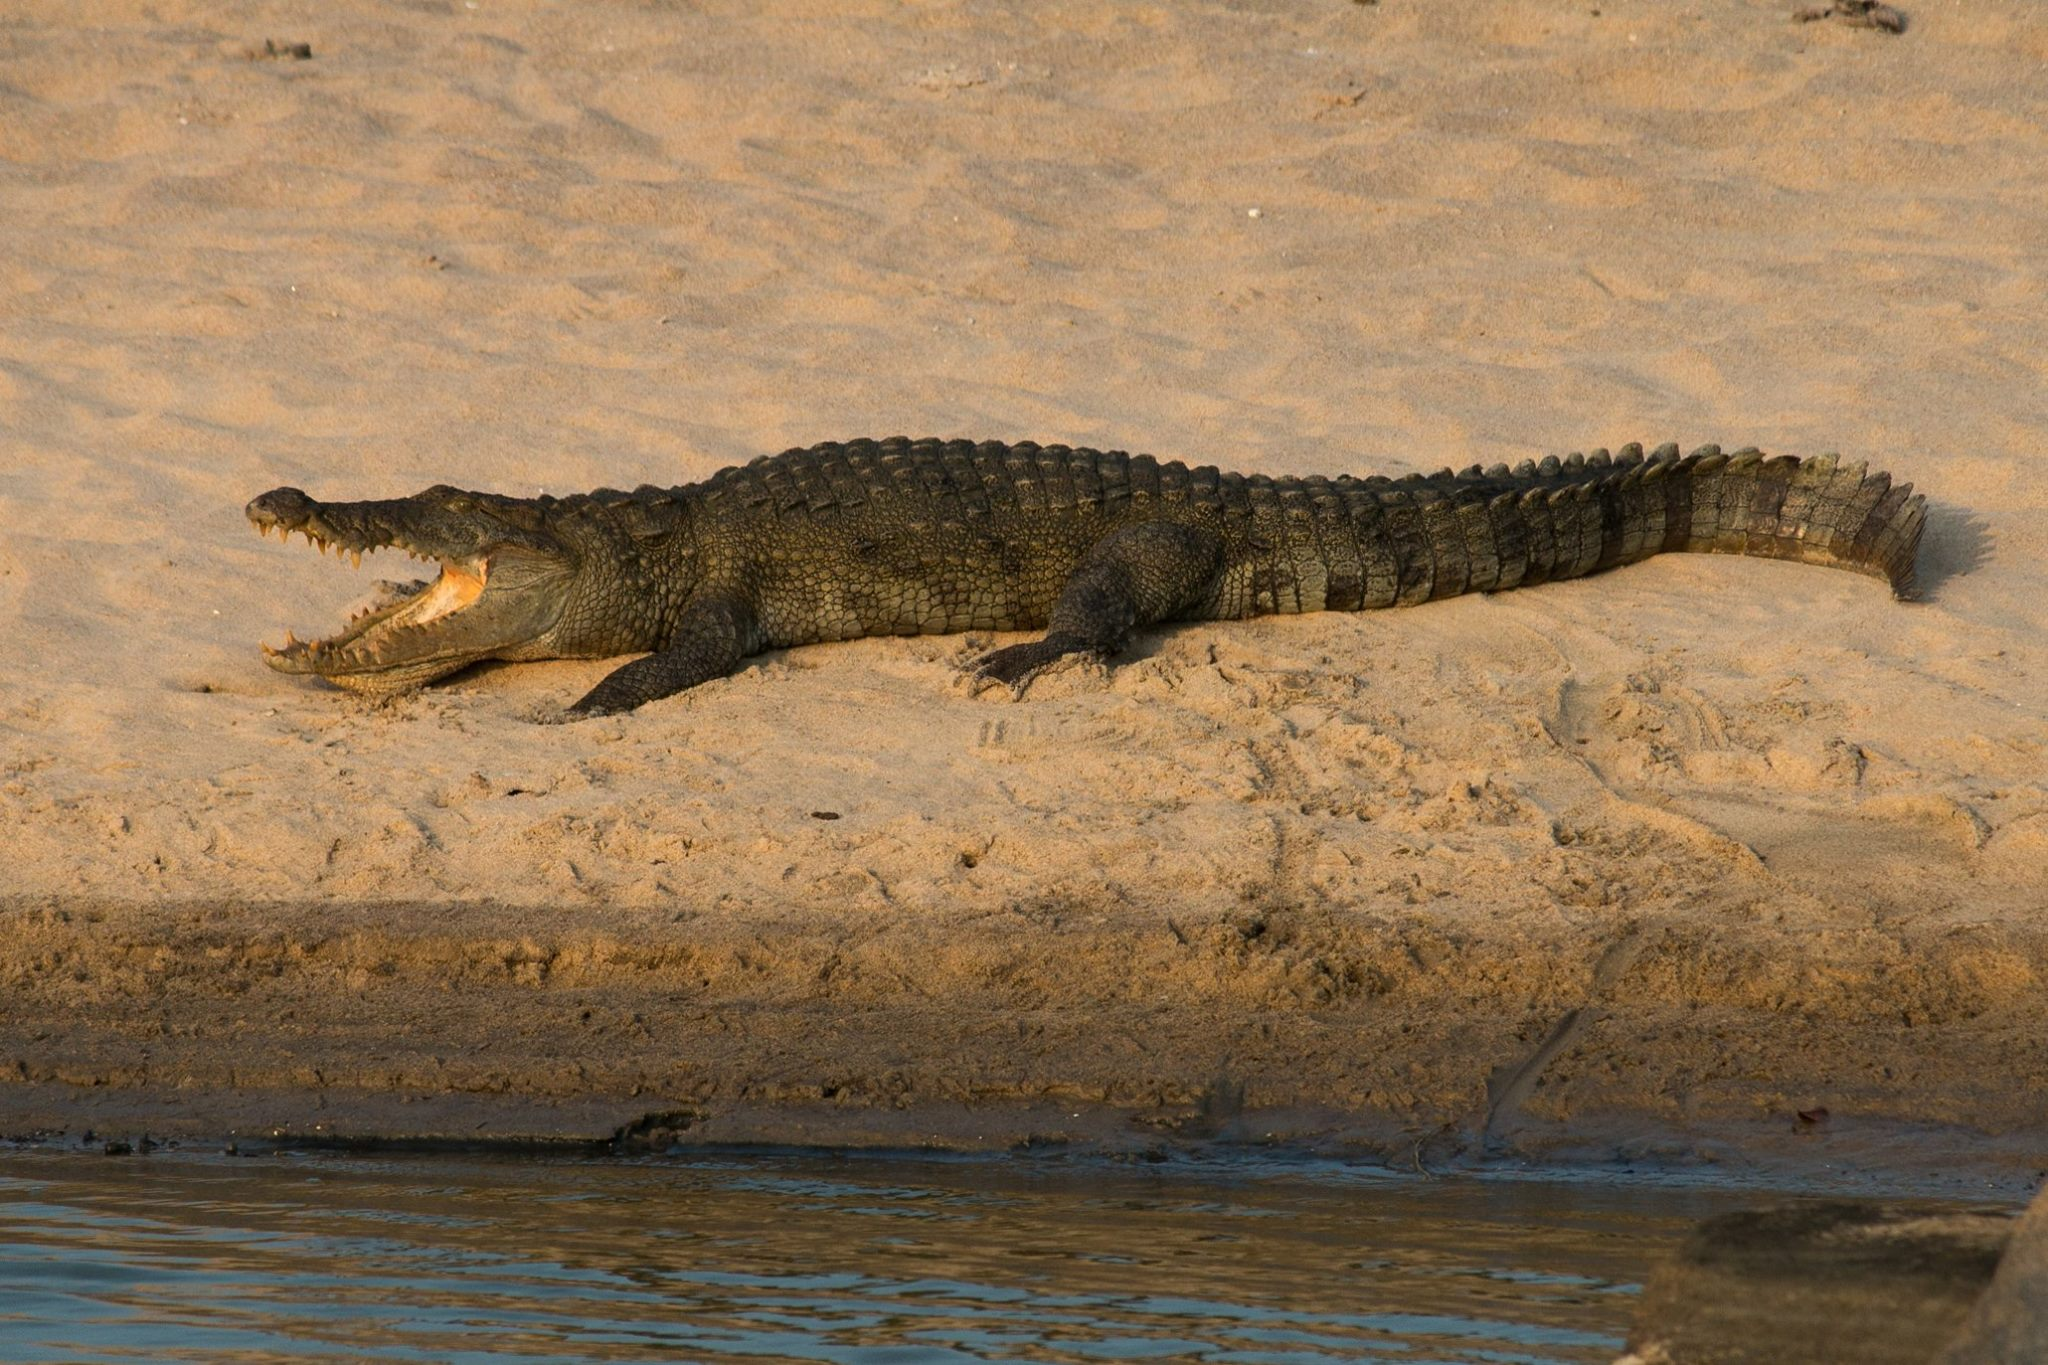 invite-to-paradise-sri-lanka-and-maldives-specialists-travel-agent-tour-operator-customer-review-feedback-joel-rhian-crocodile-2.jpg